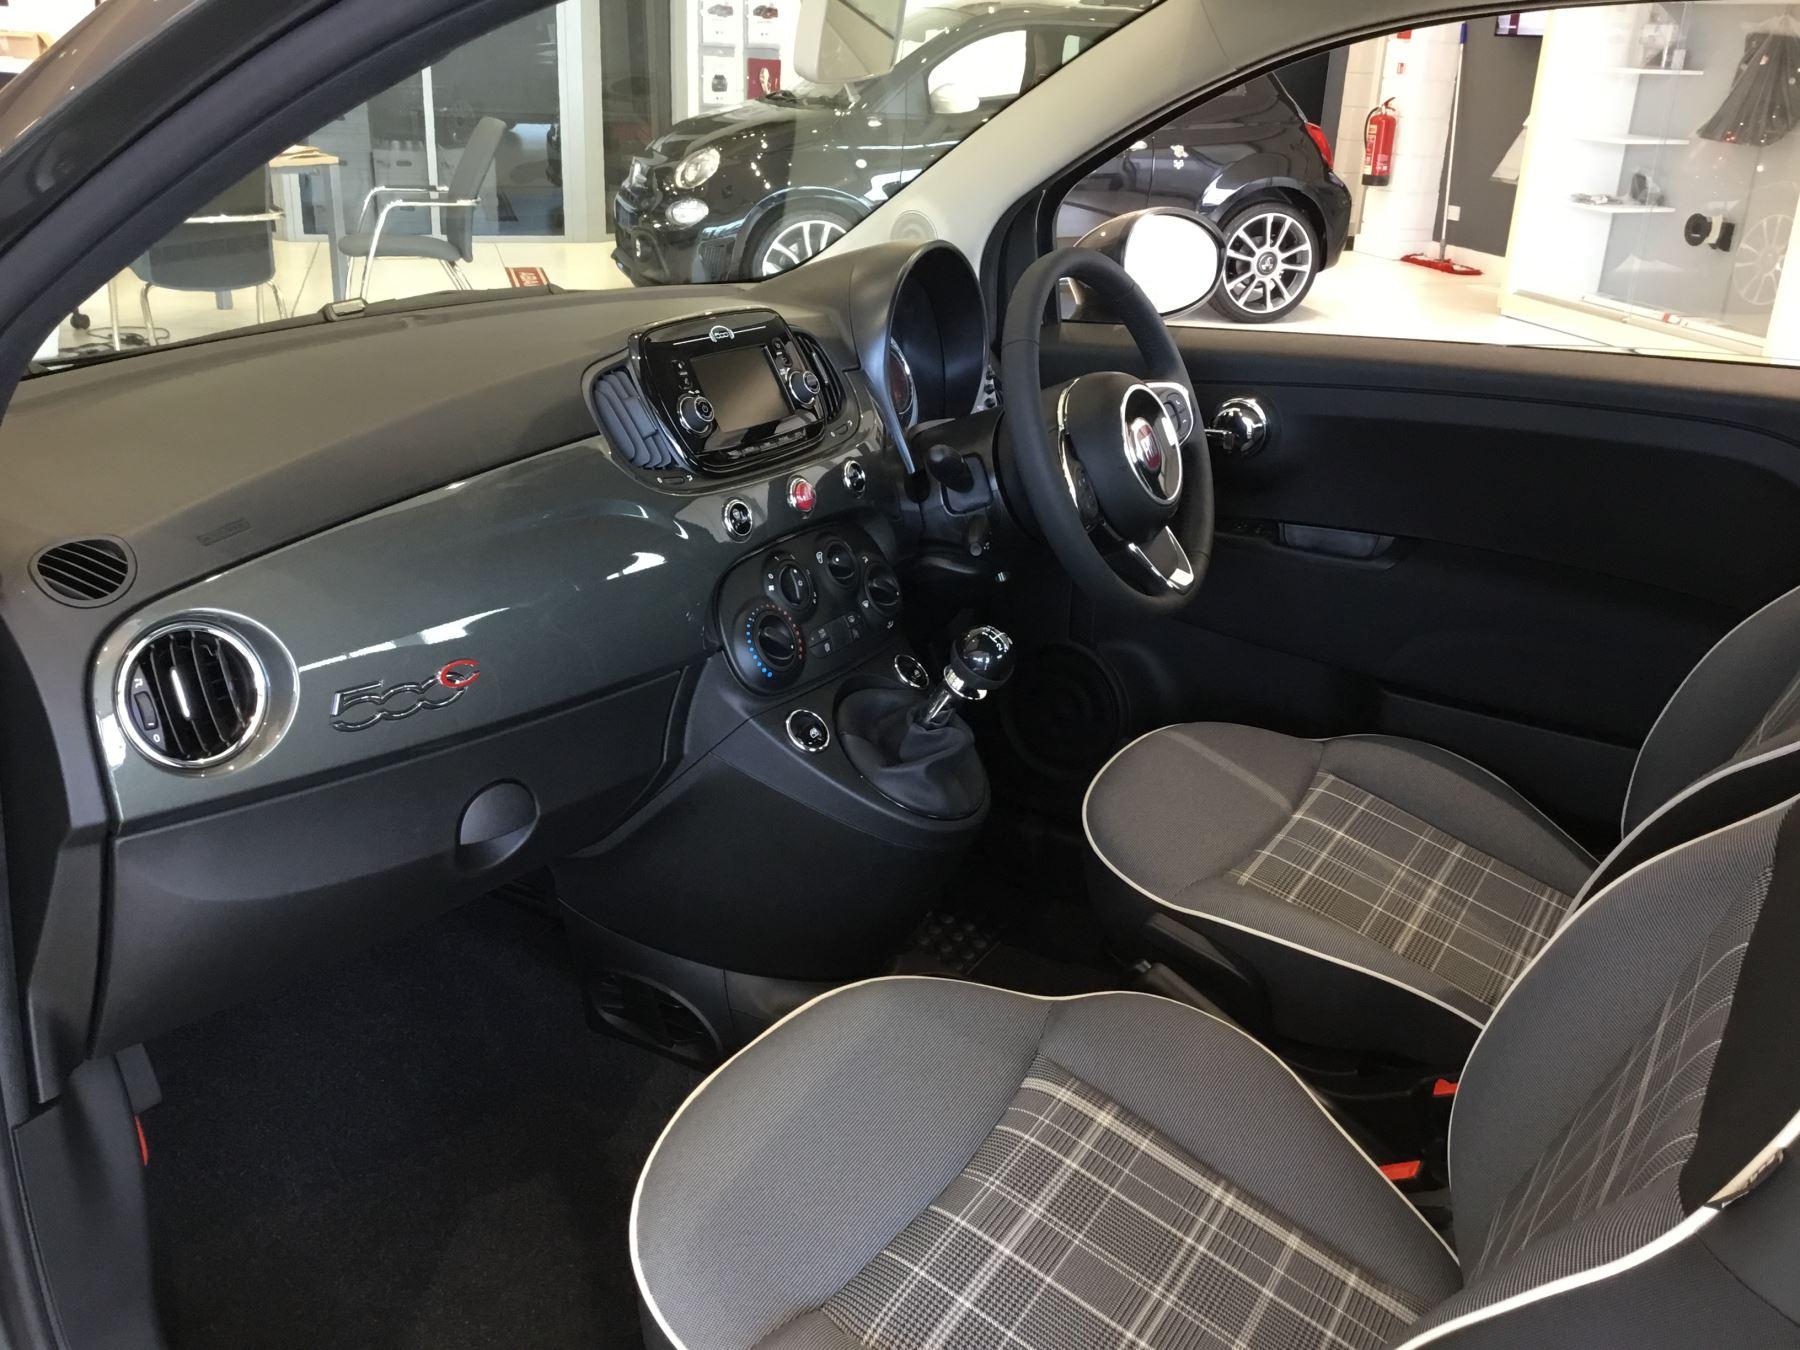 Fiat 500 1.2 Lounge 2dr image 6